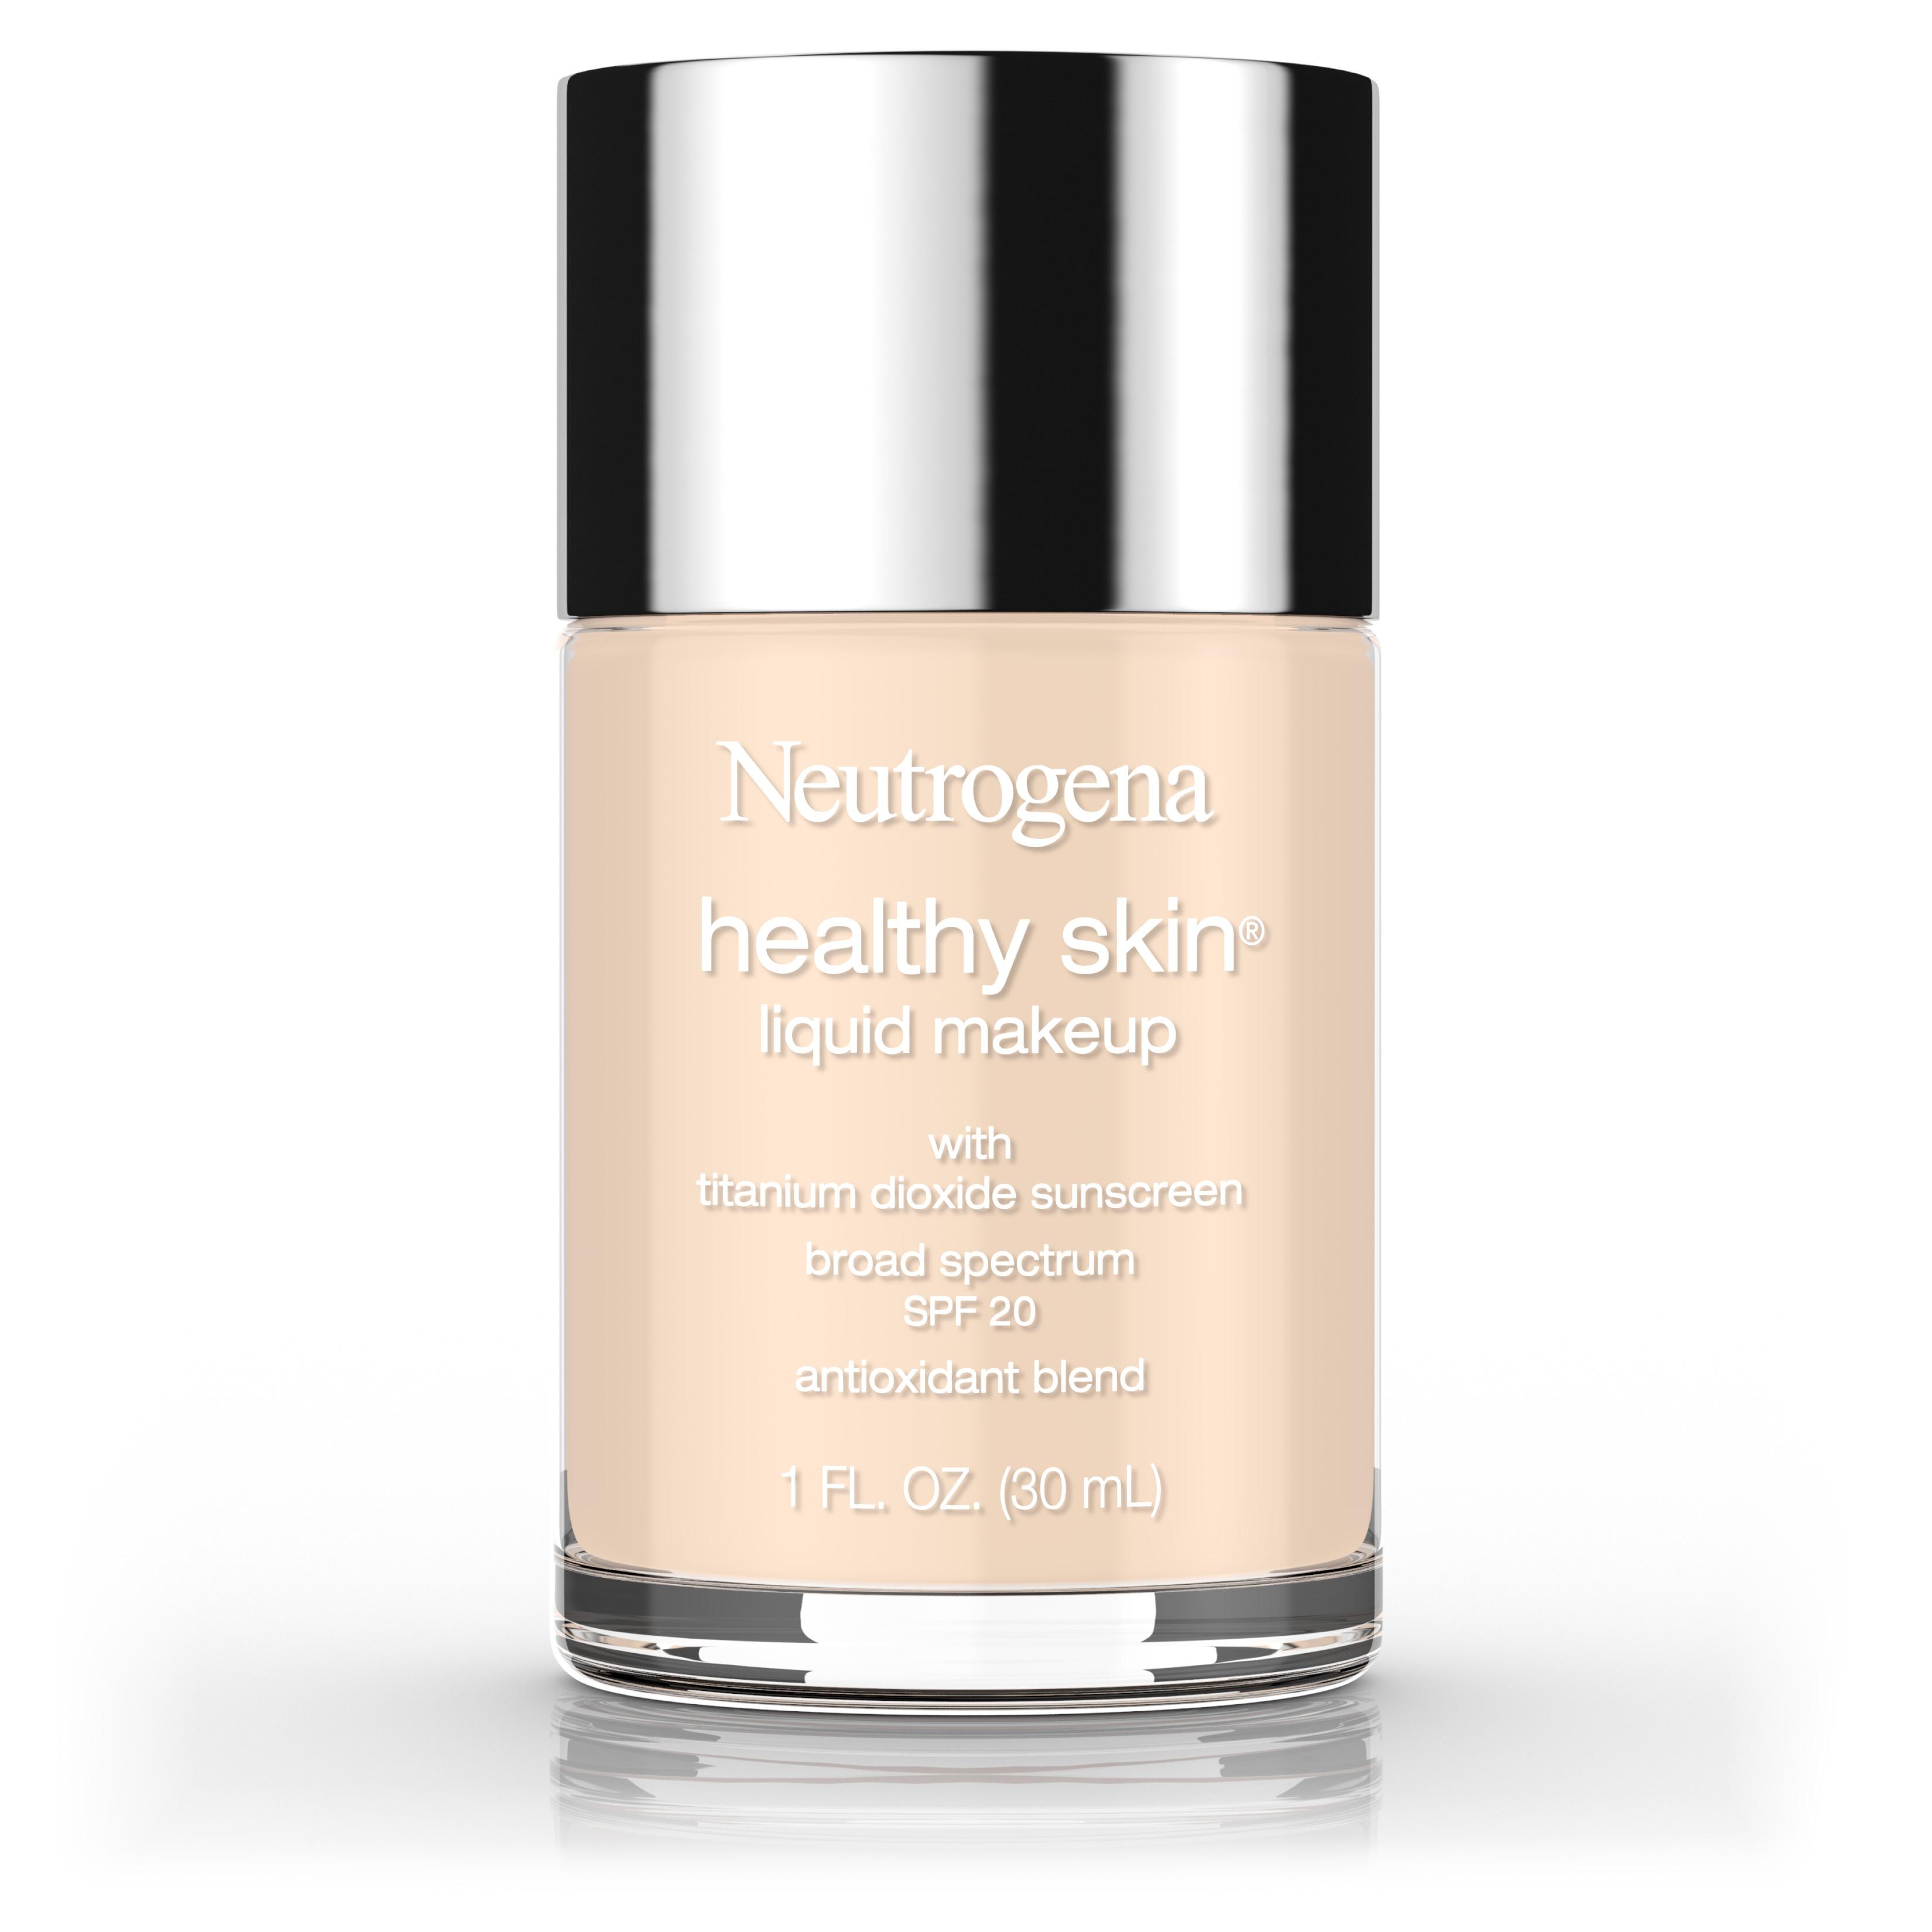 Johnson & Johnson Consumer Inc. Neutrogena Healthy Skin Liquid Makeup